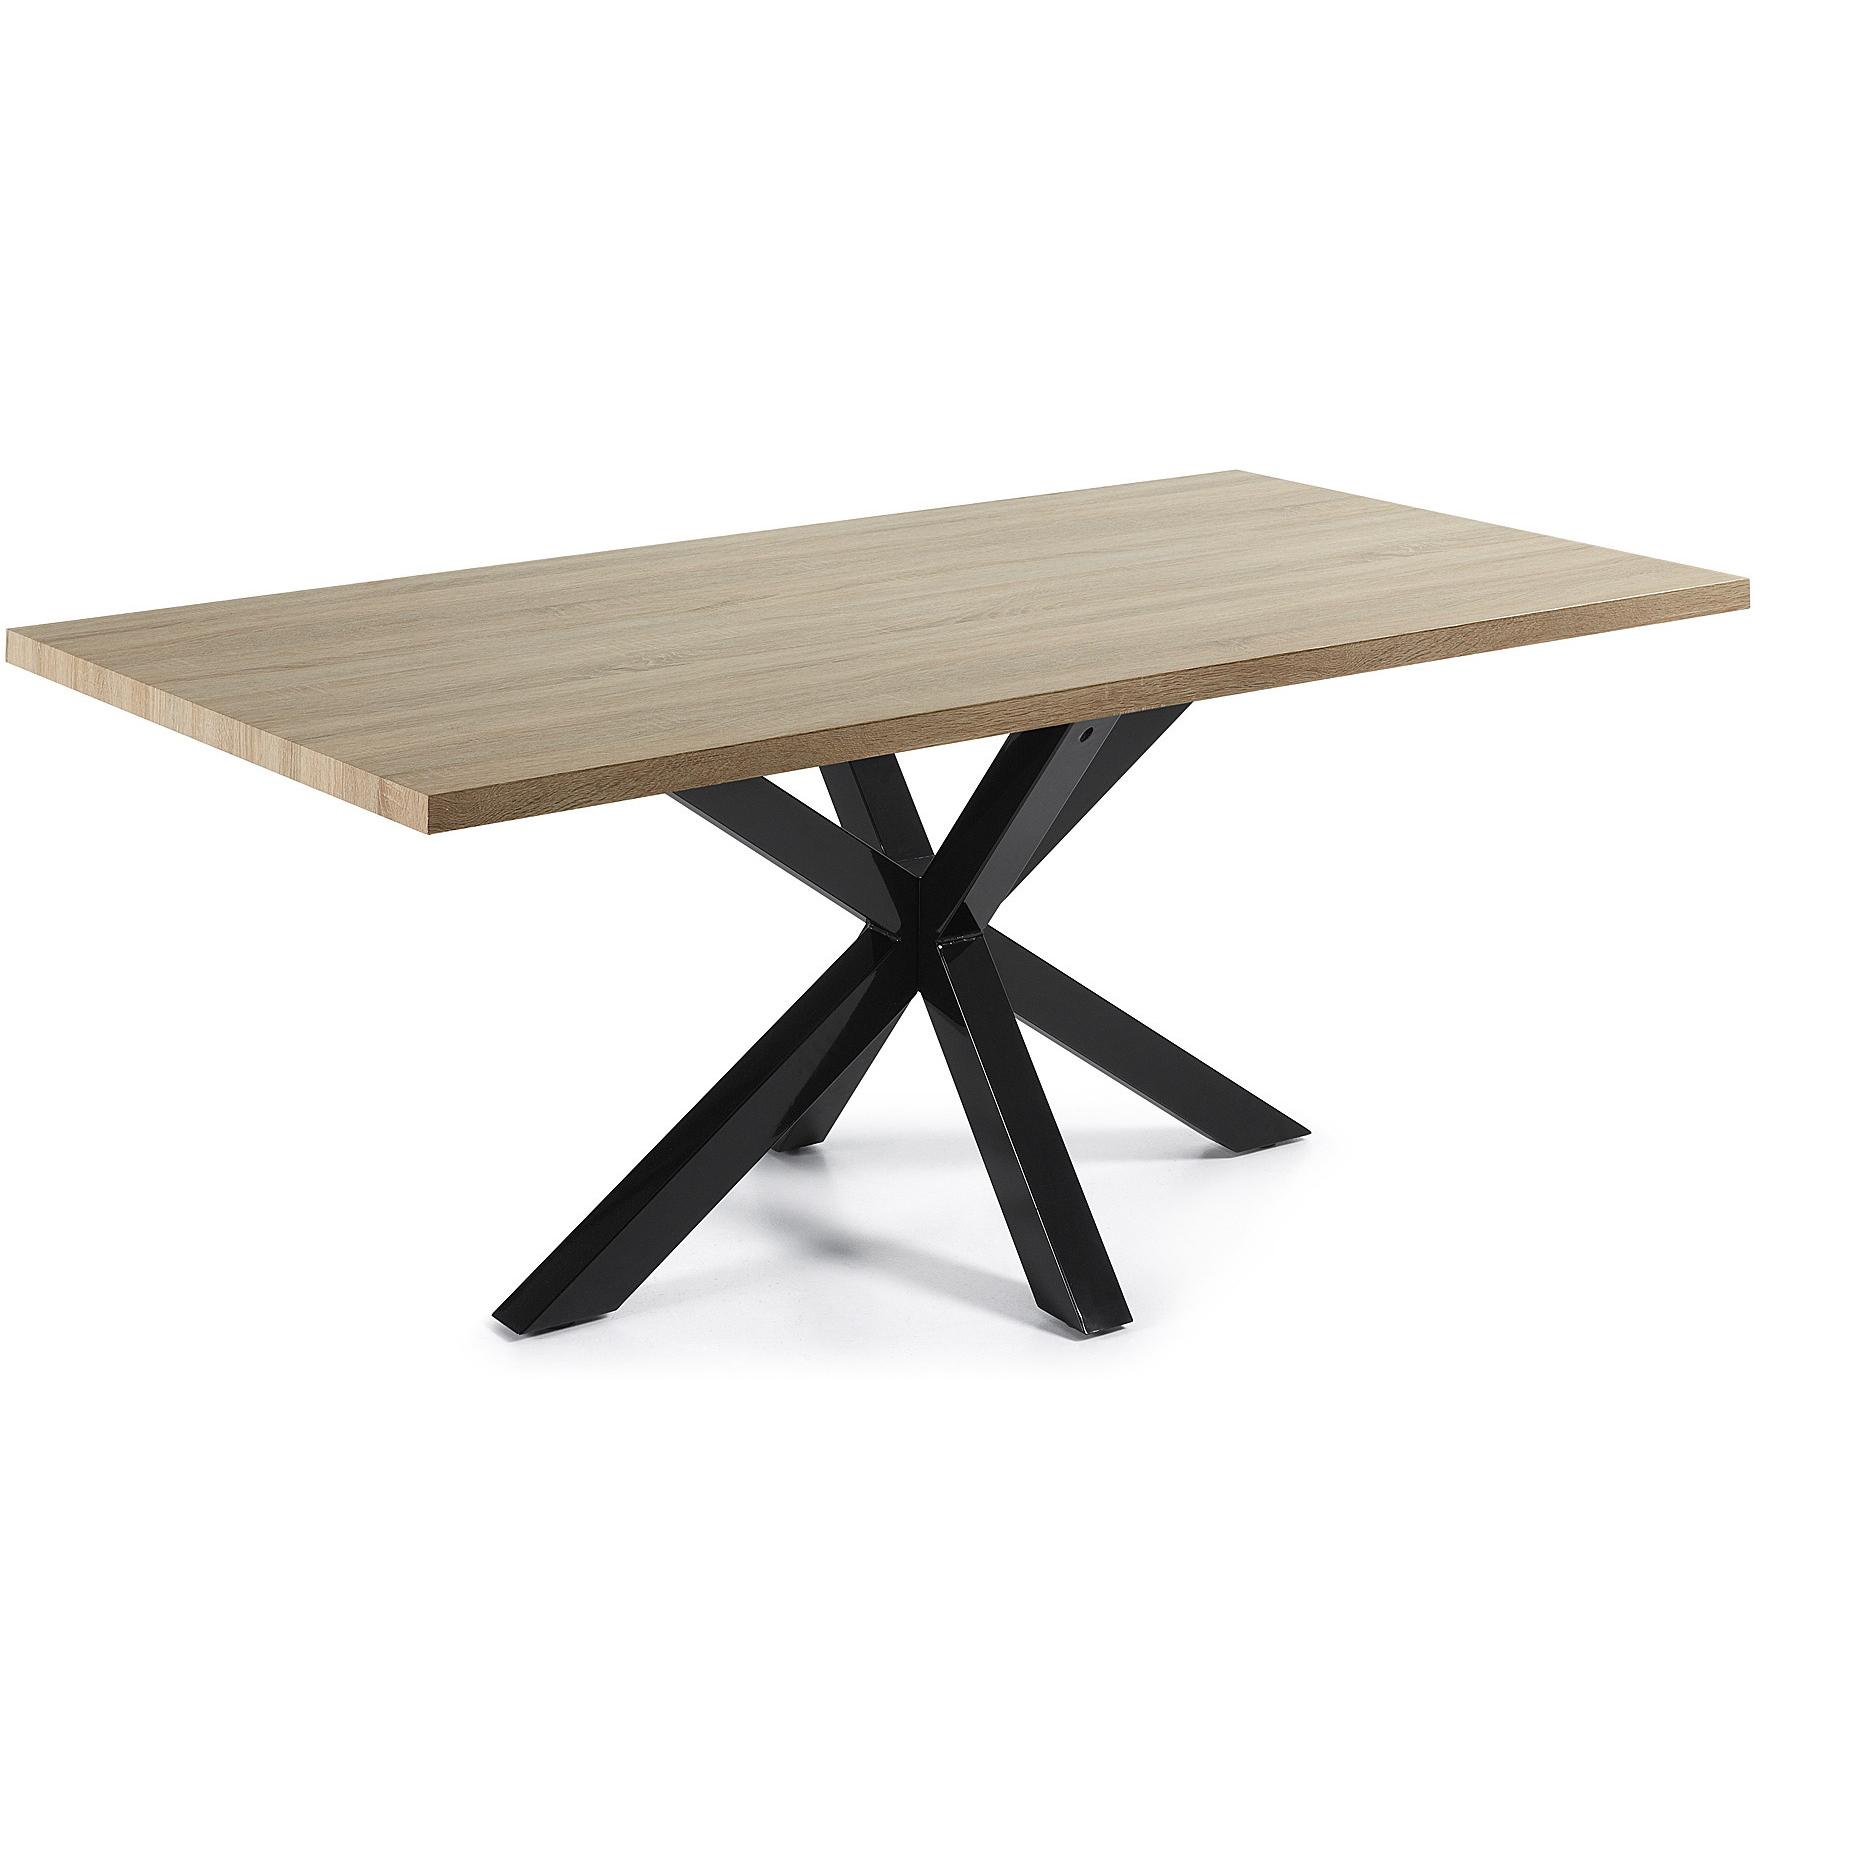 Kave Home Eettafel 'Argo' zwart / hout, 200 x 100cm